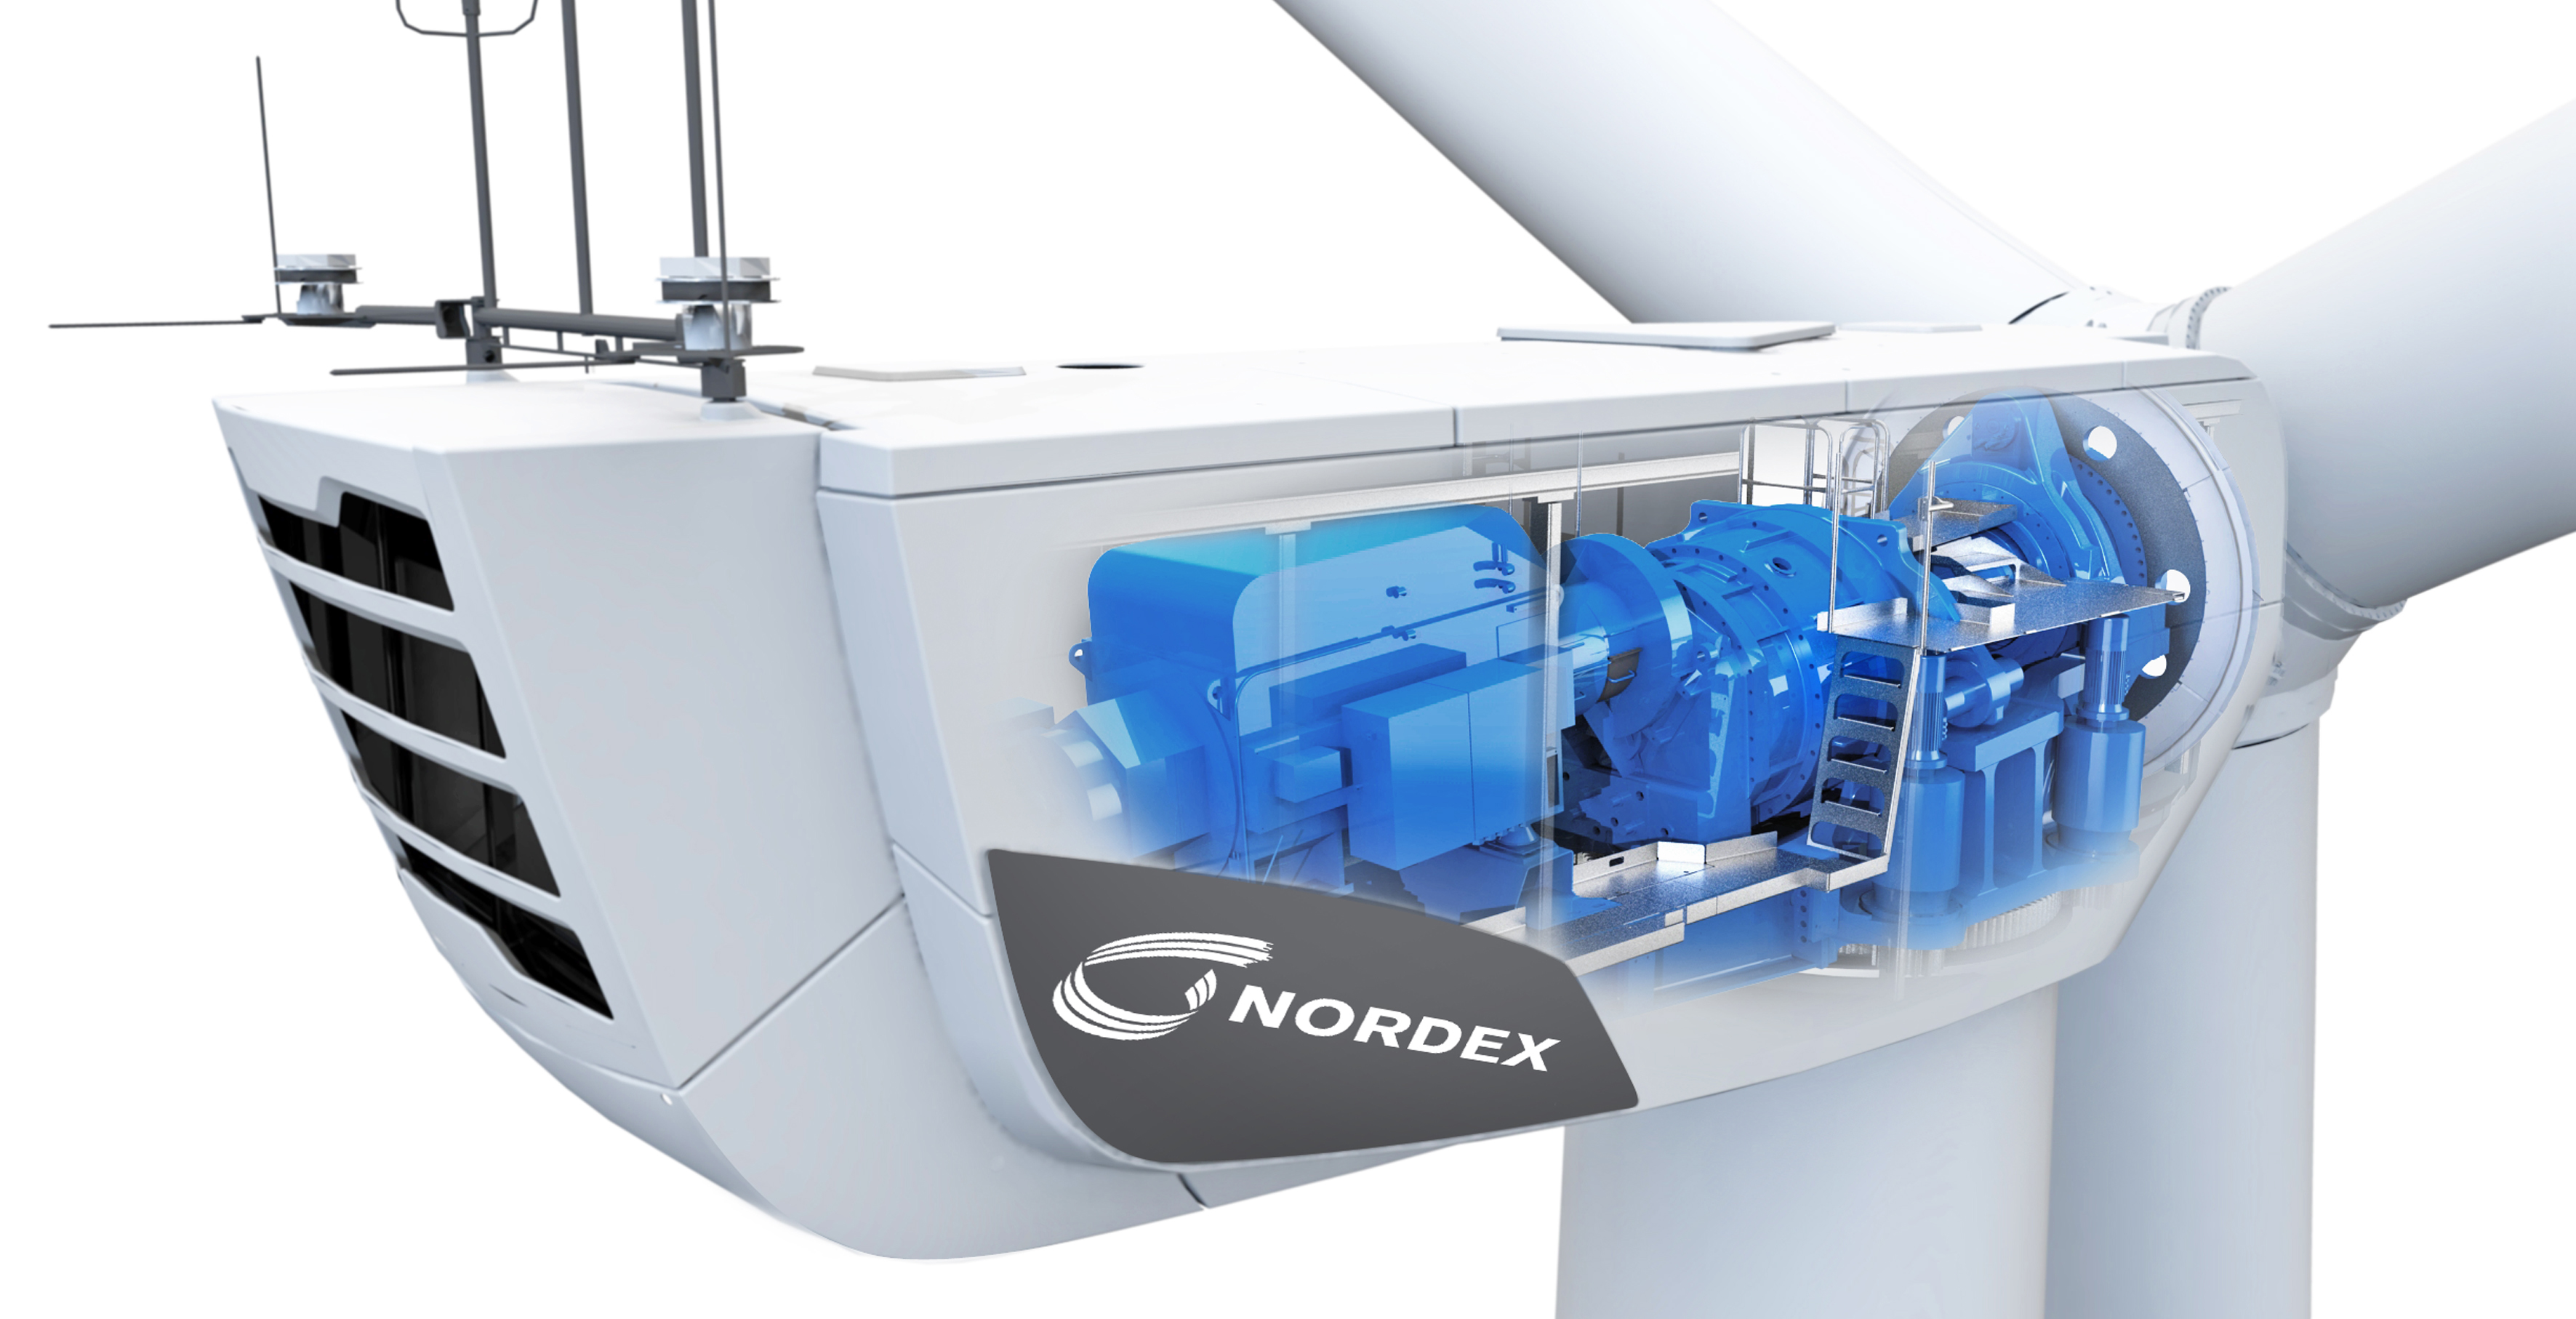 Nordex HEP wind farm